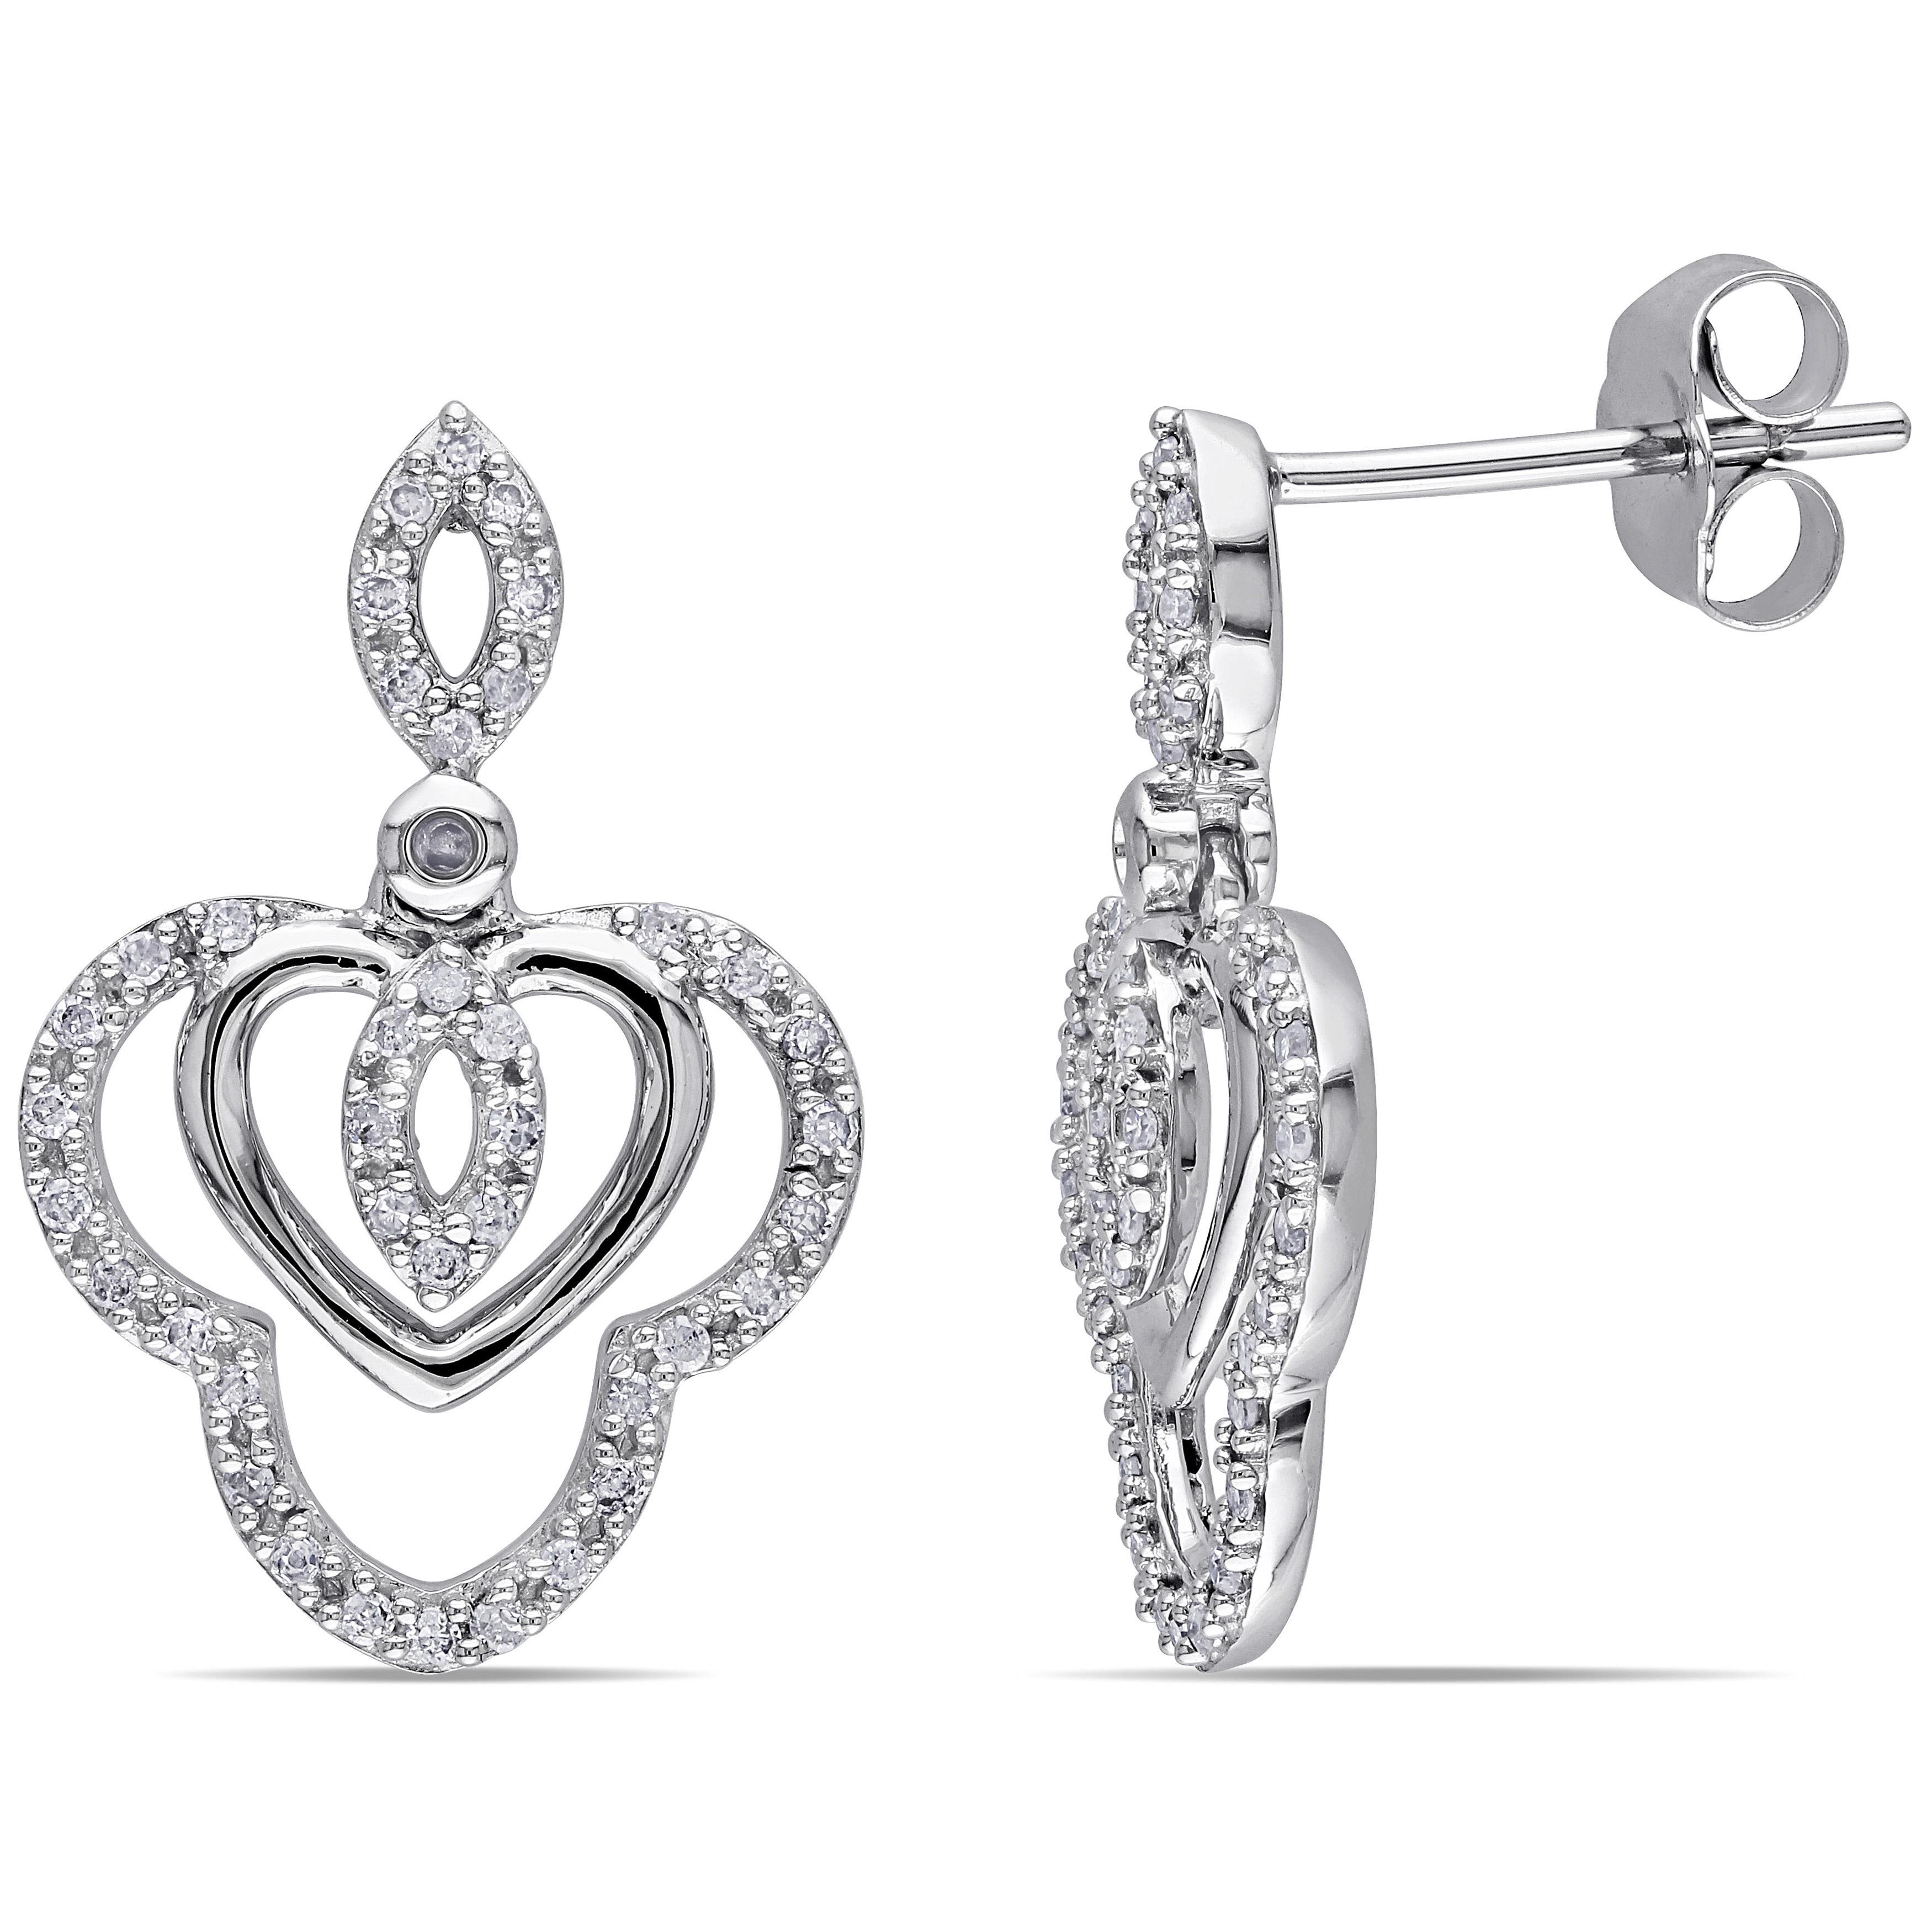 Miadora 10k White Gold 1/4ct TDW Diamond Dangle Earrings (H-I, I2-I3) at Sears.com